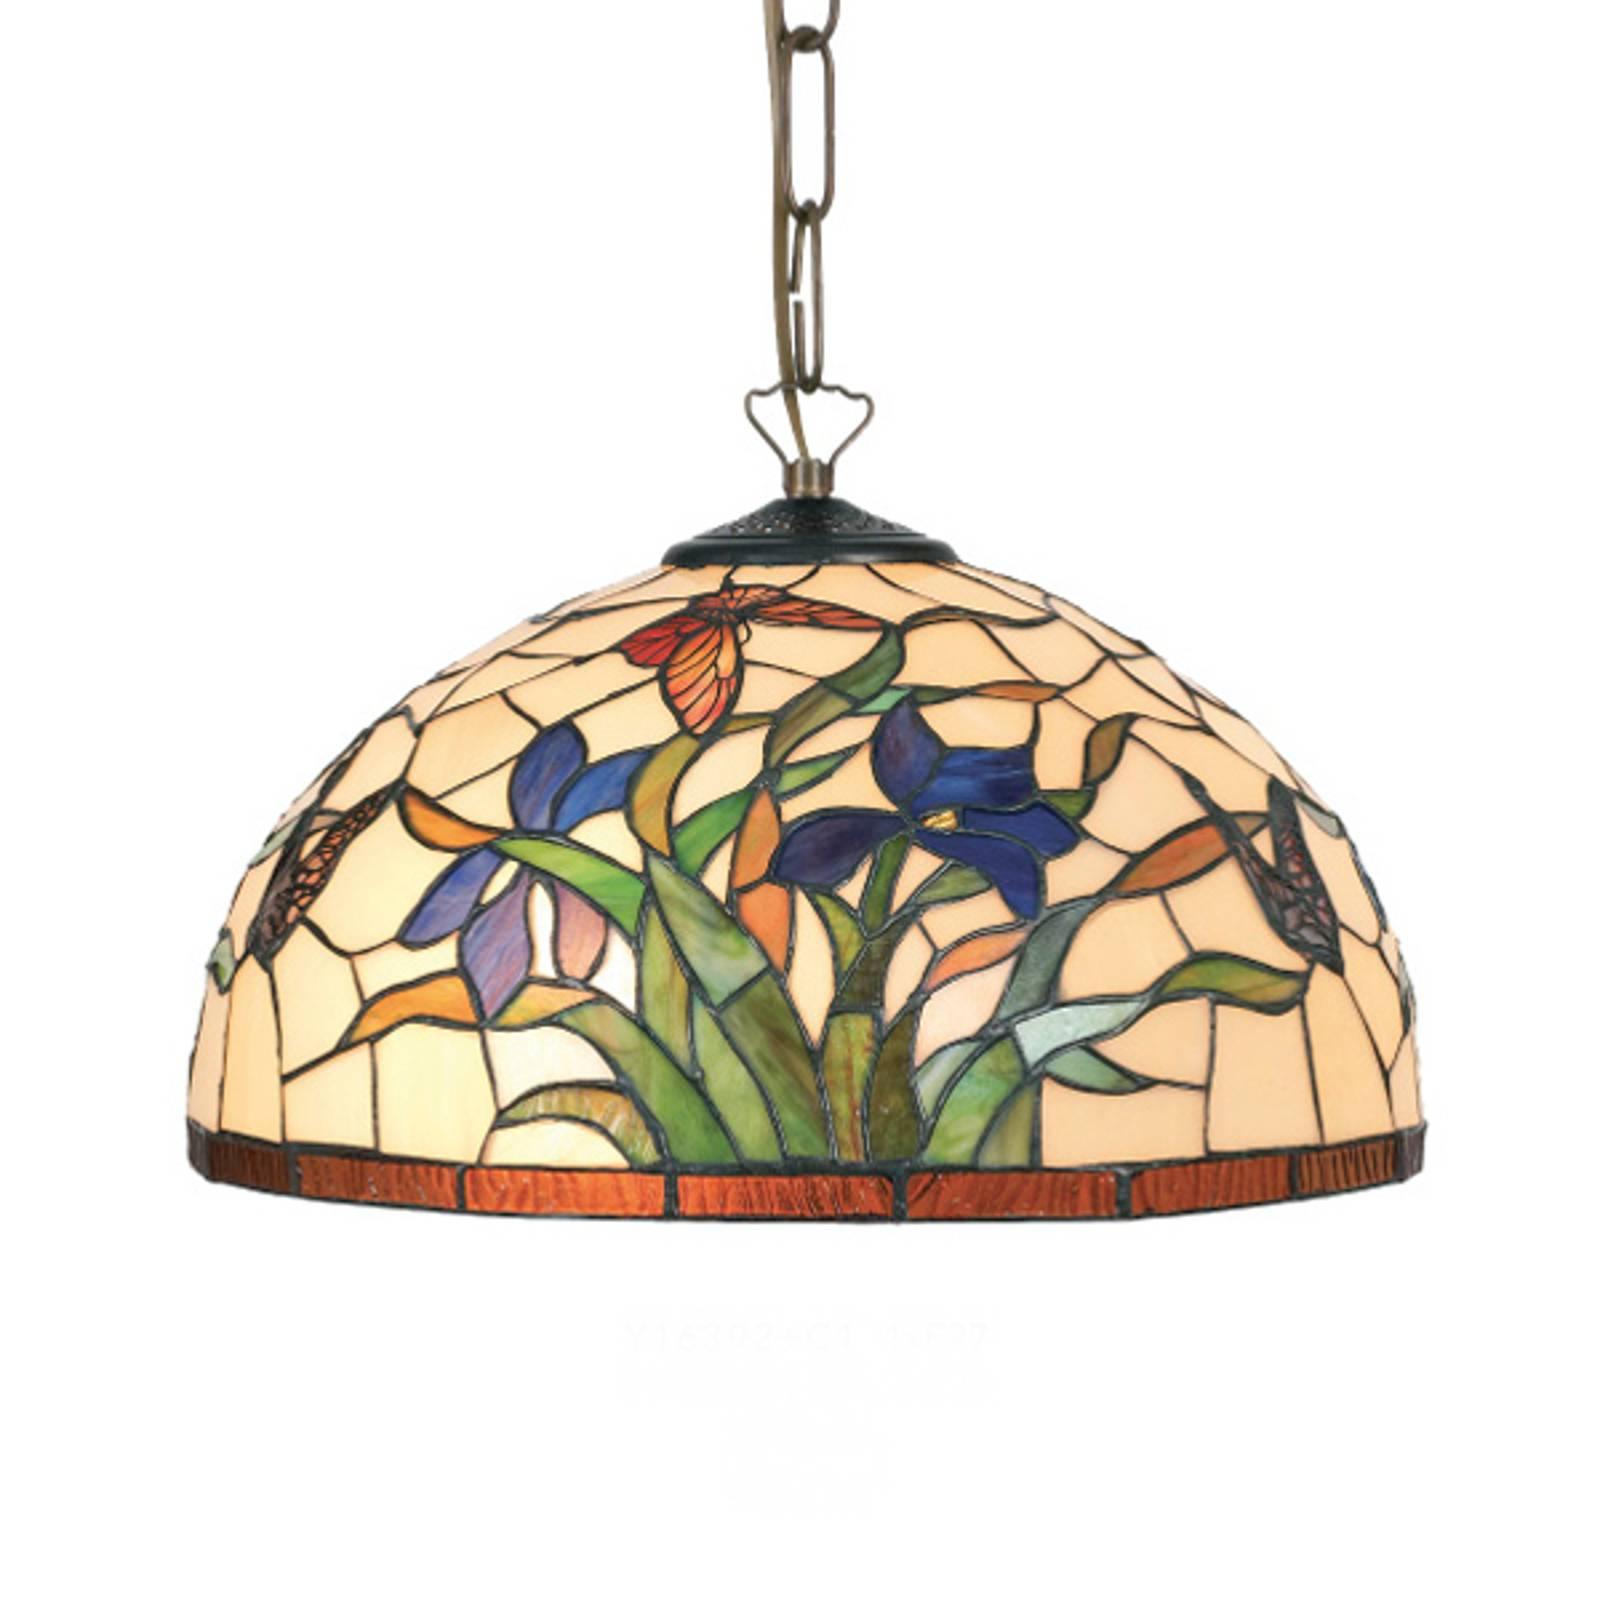 Suspension Elanda style Tiffany à 1 lampe